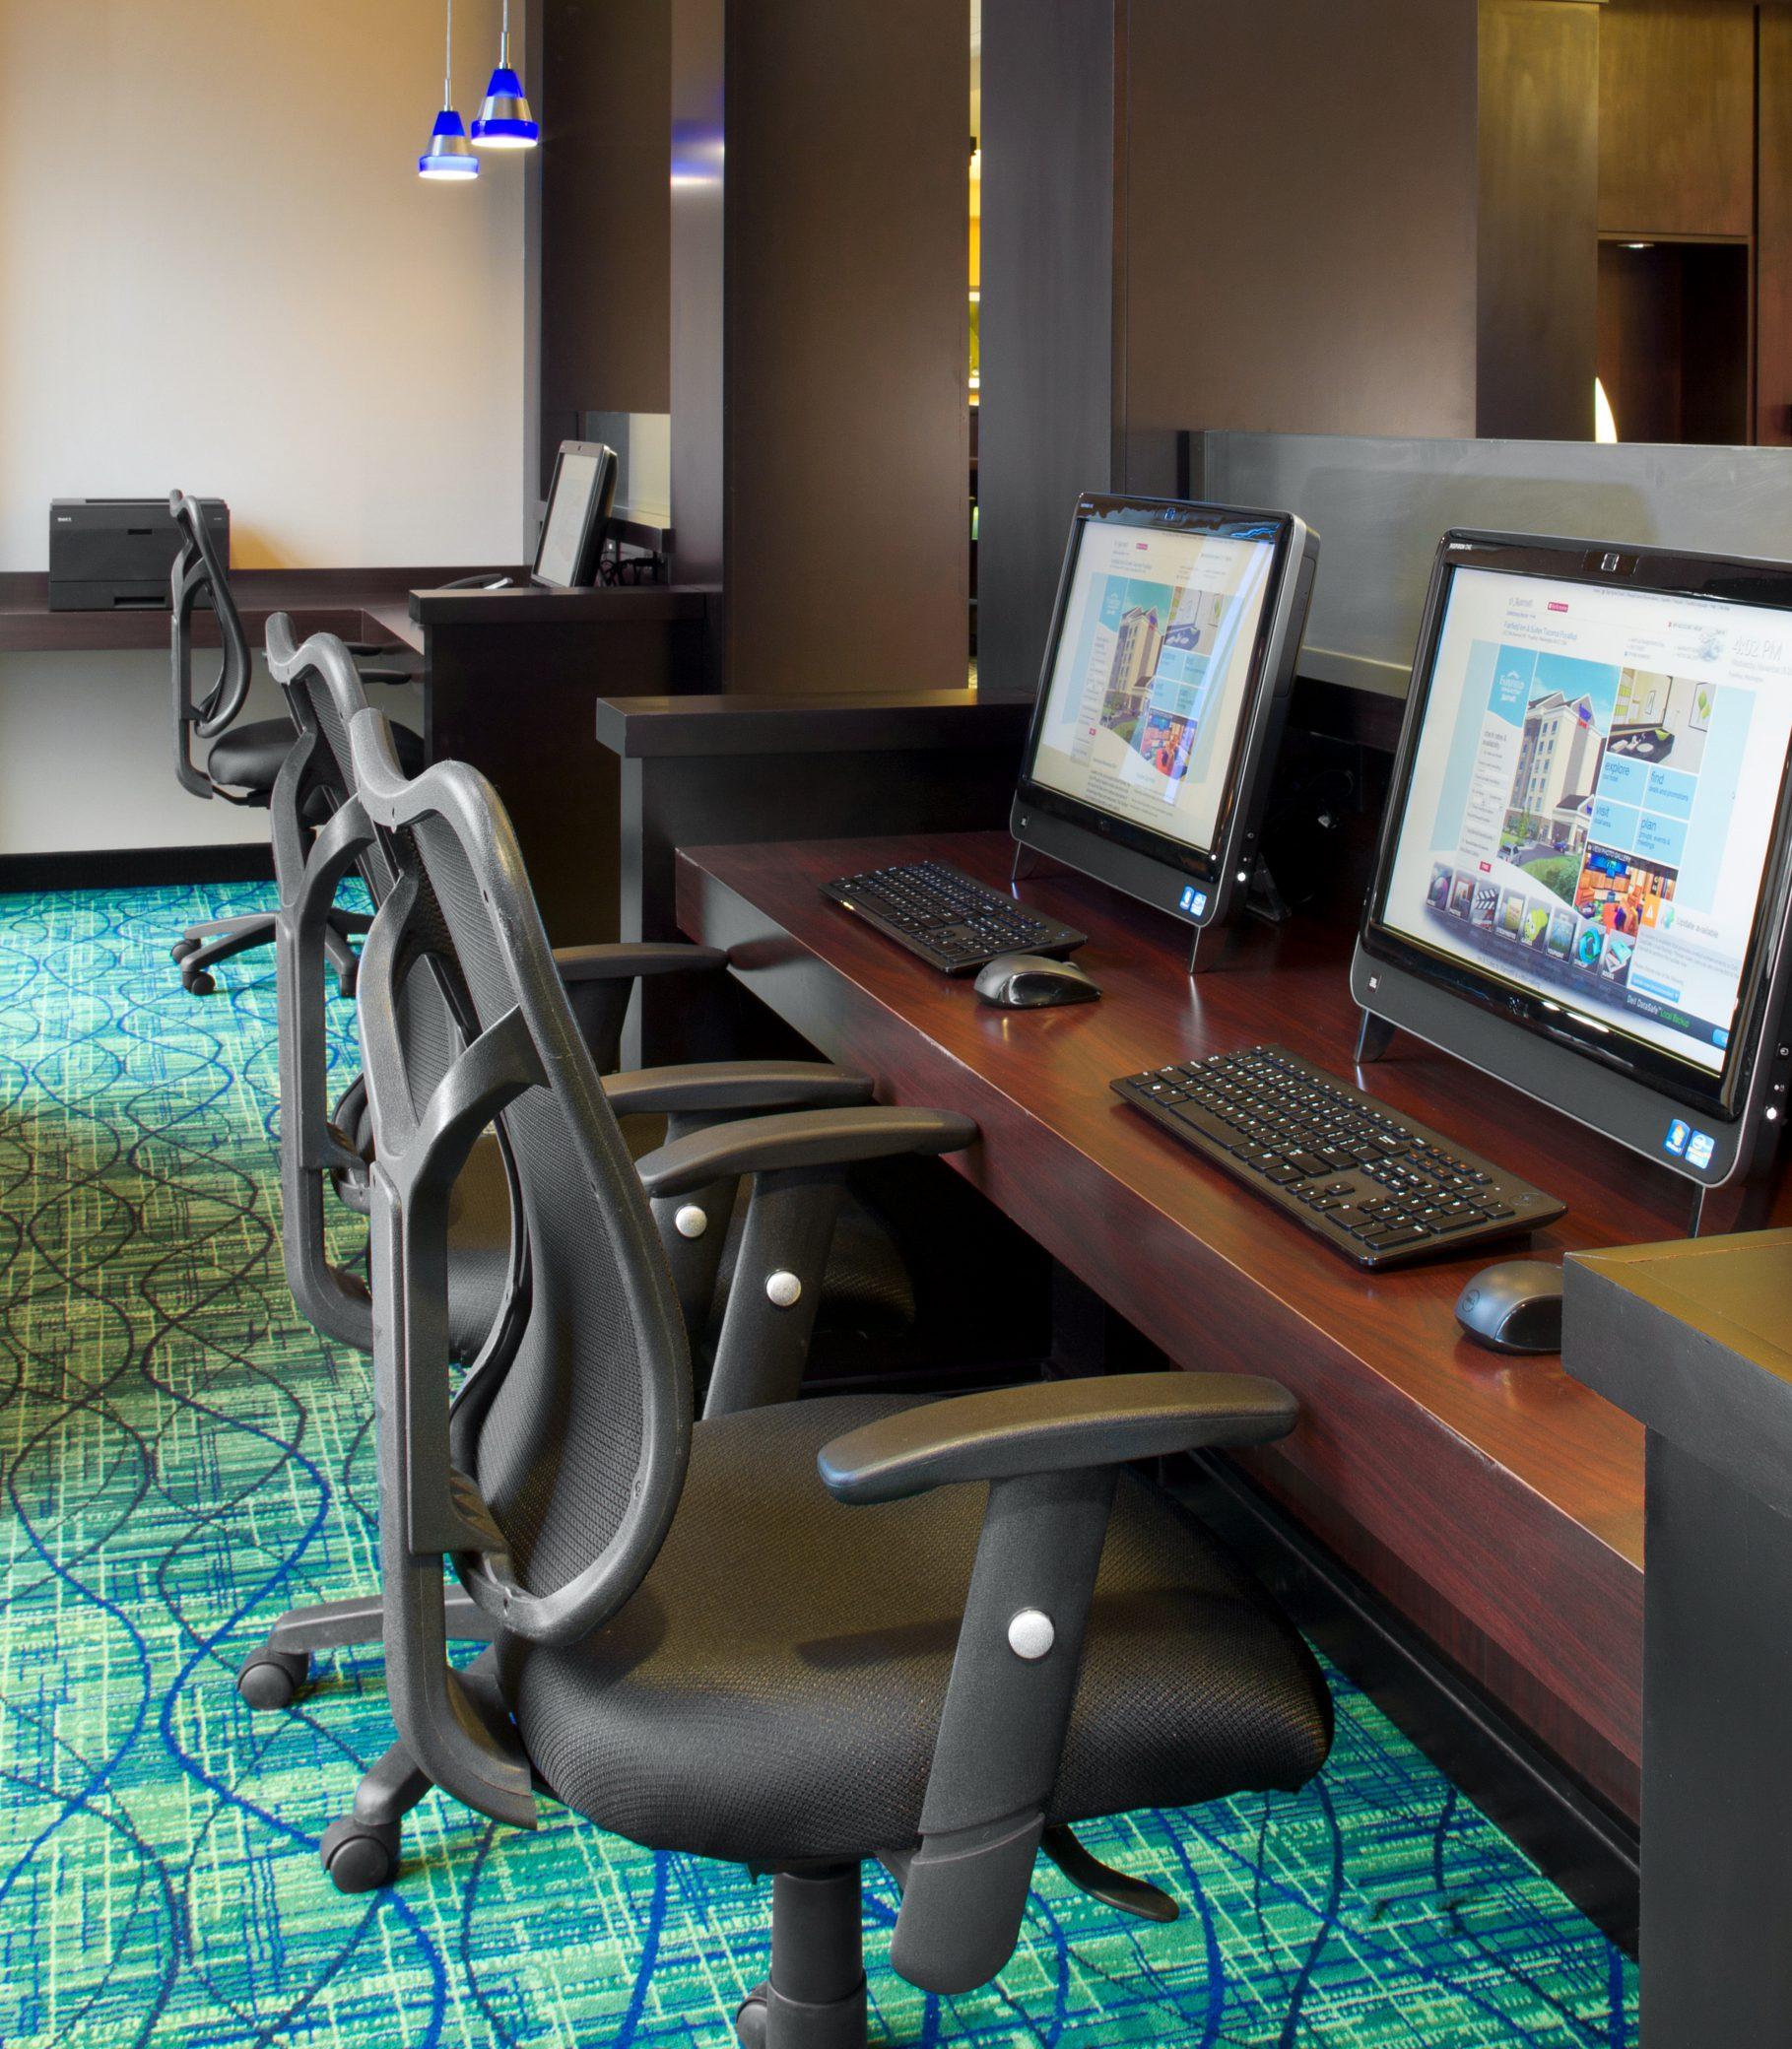 Fairfield Inn & Suites by Marriott Tacoma Puyallup image 7